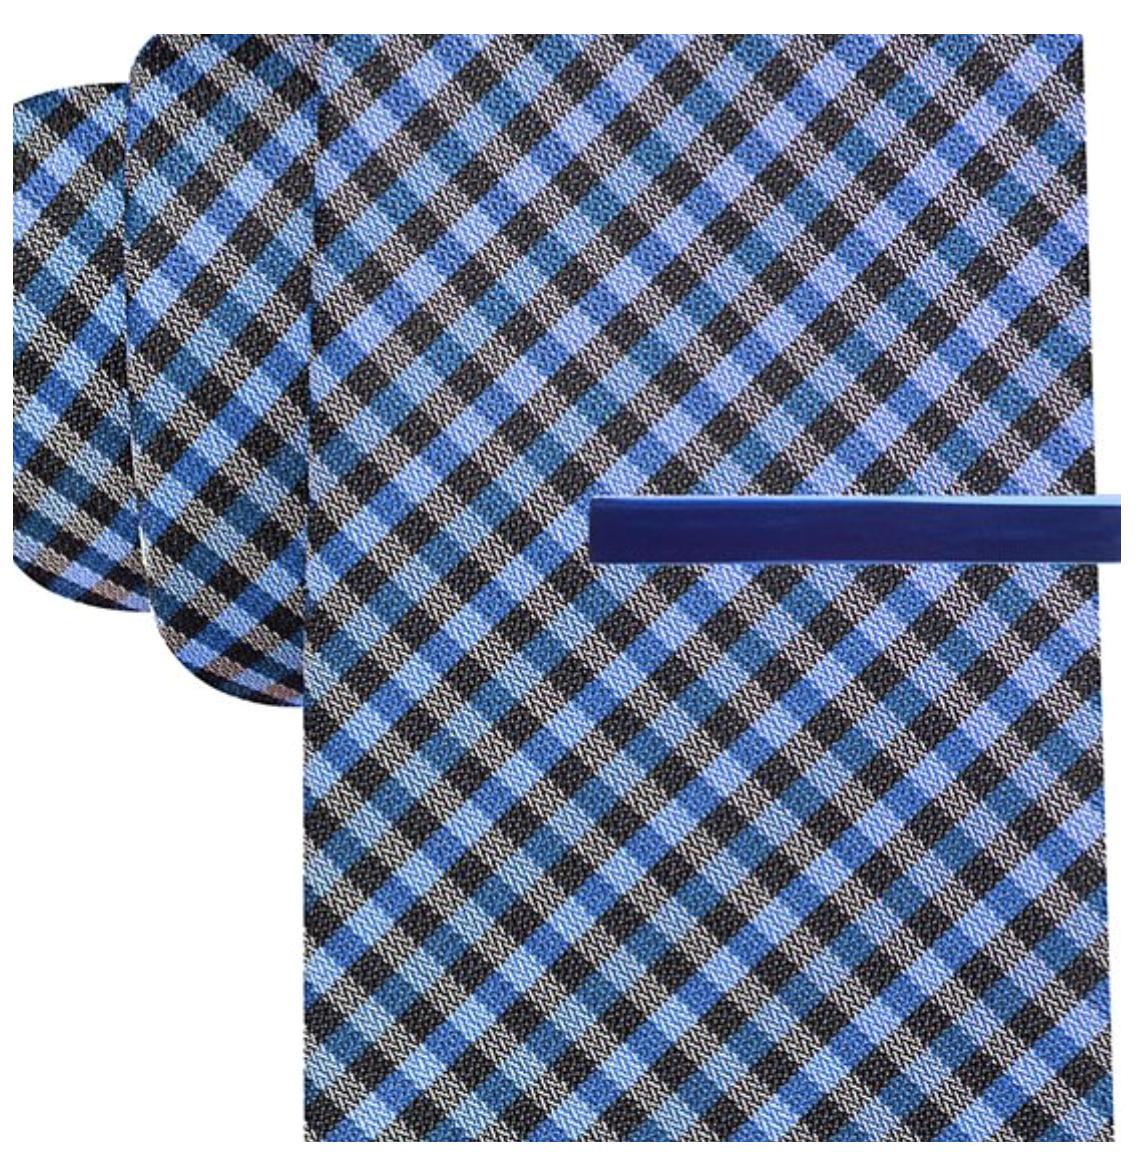 Alfani Spectrum Silk Tortola Grid Woven Necktie, Orange MSRP $49.50